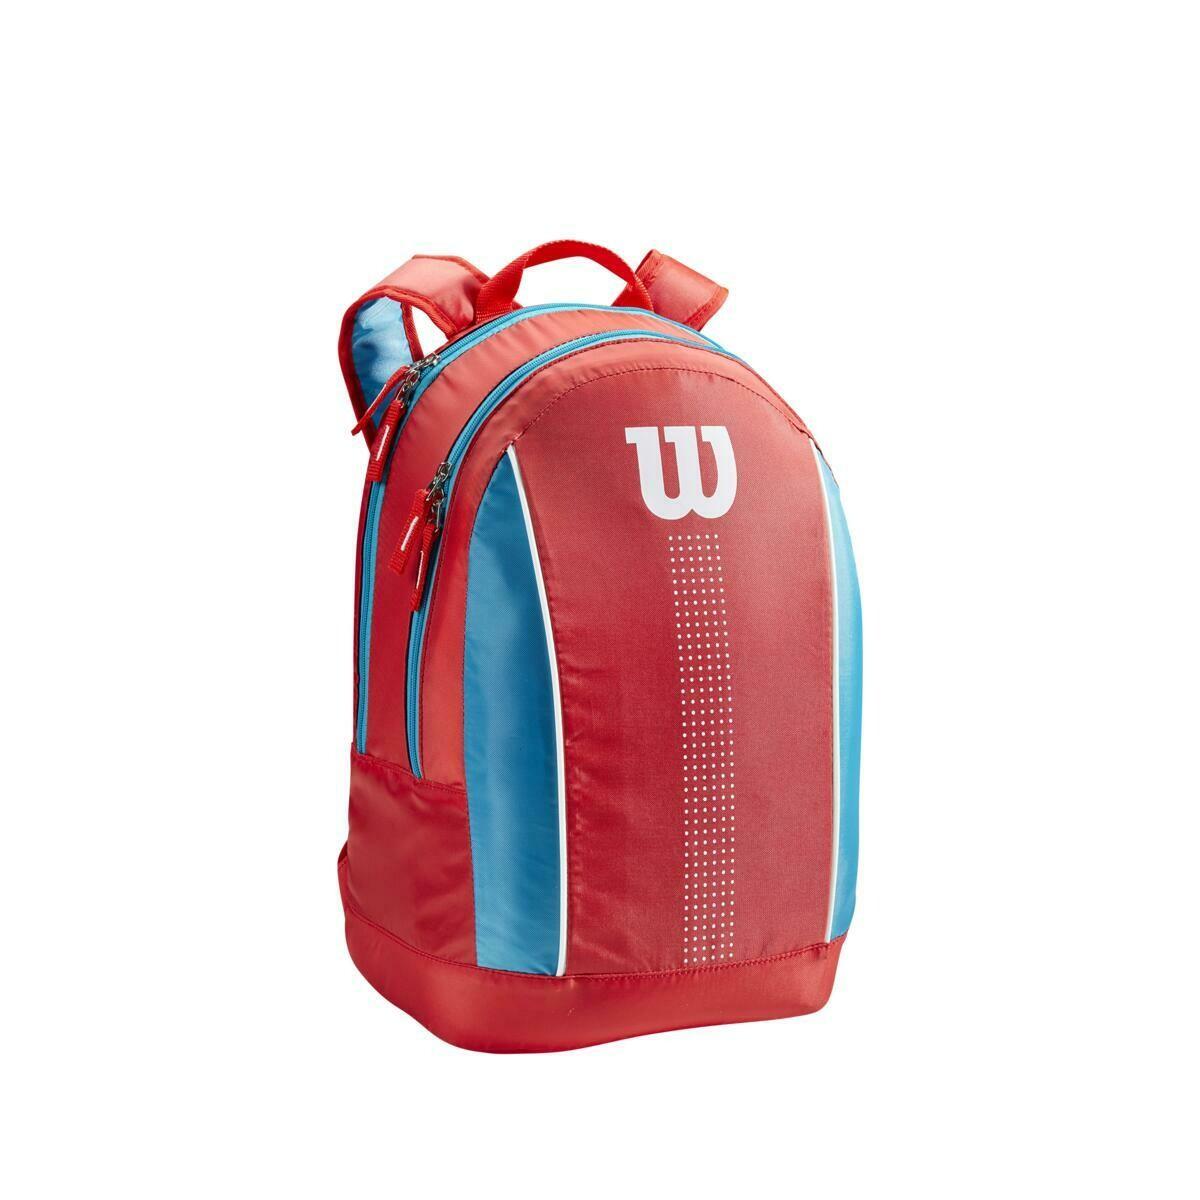 Wilson Junior Backpack - Coral